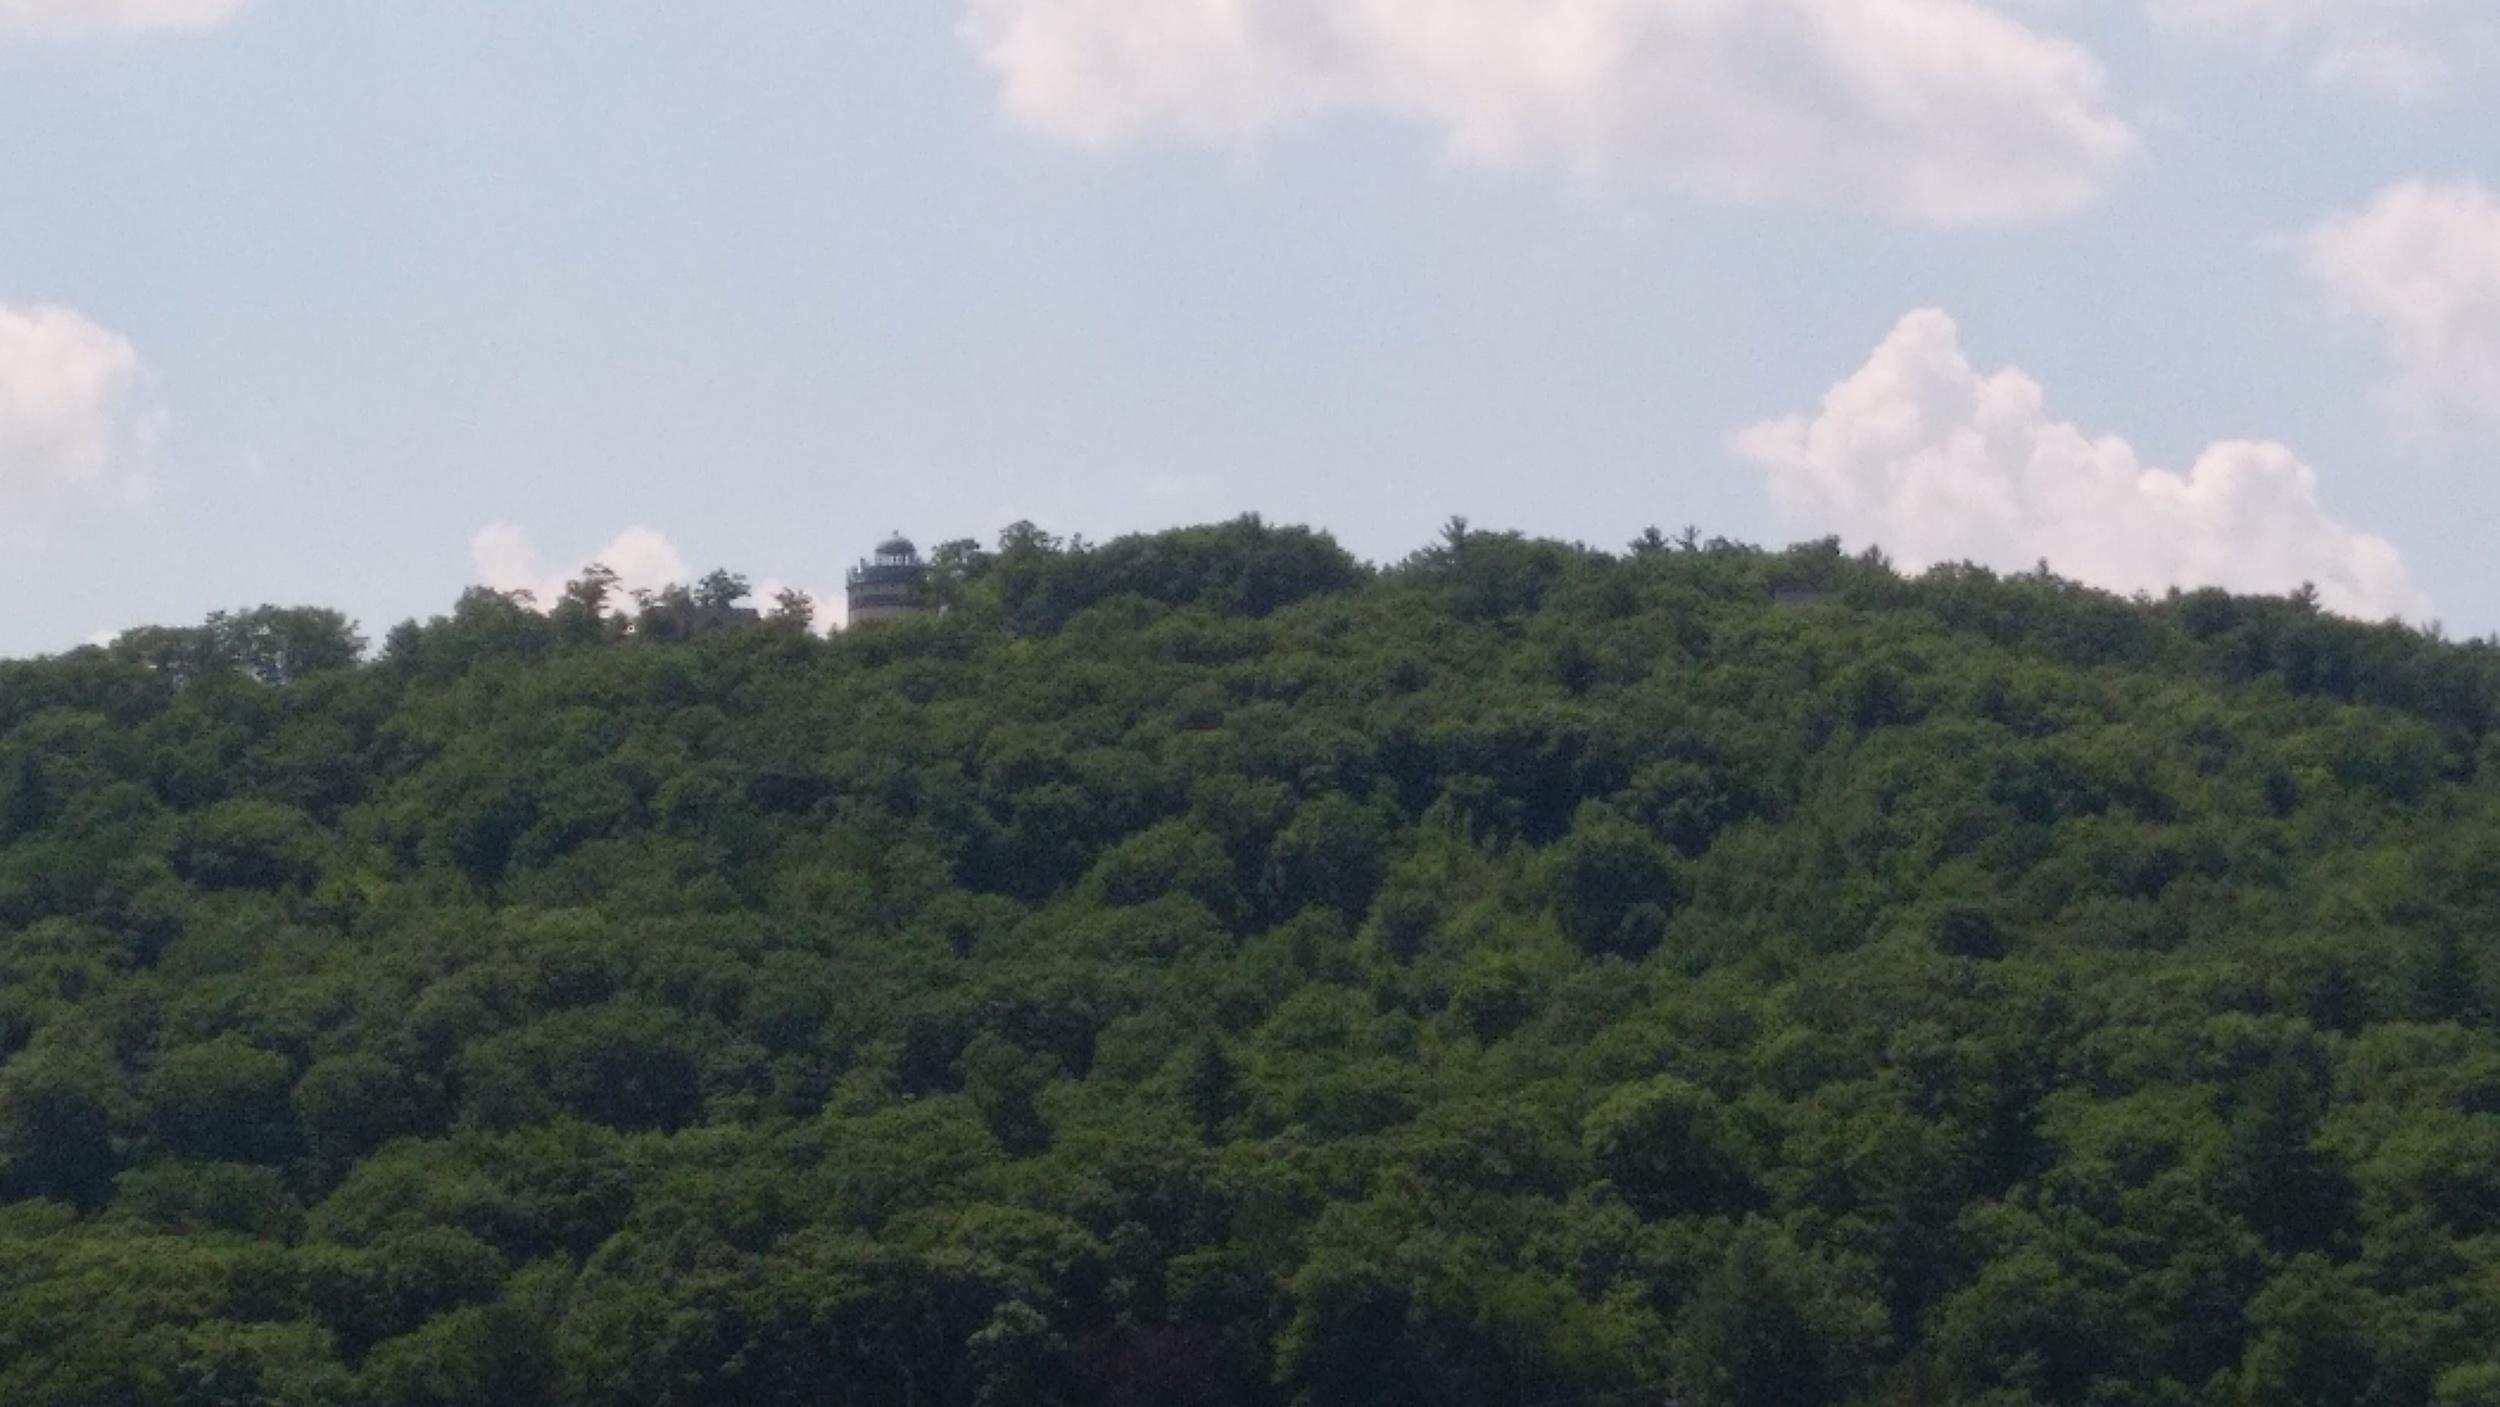 Hills along the lake